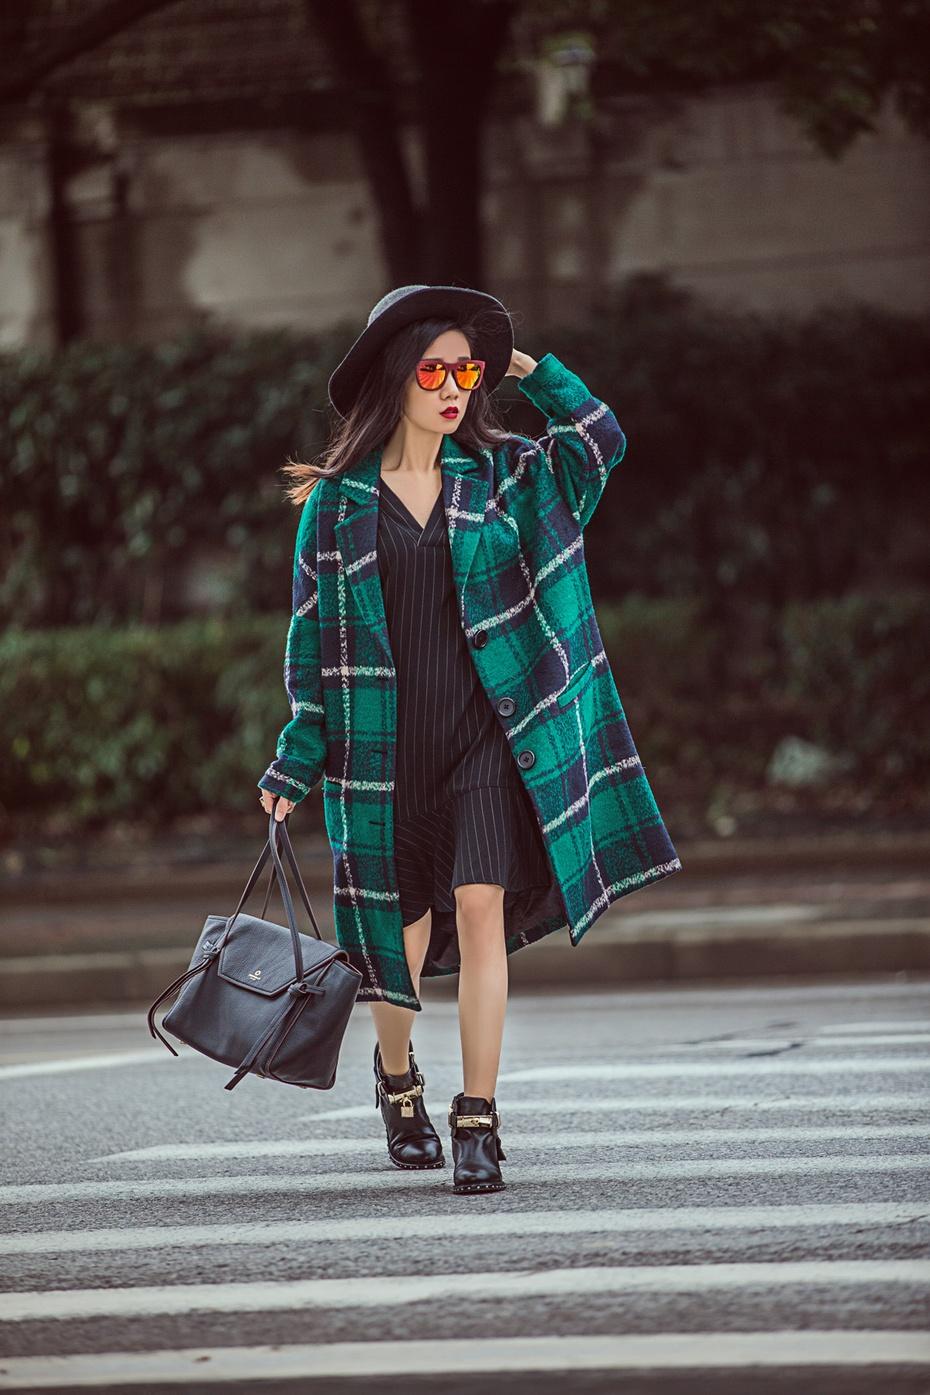 [Ava搭配周记]众里寻他千百度 你要几度就几度 - AvaFoo - Avas Fashion Blog